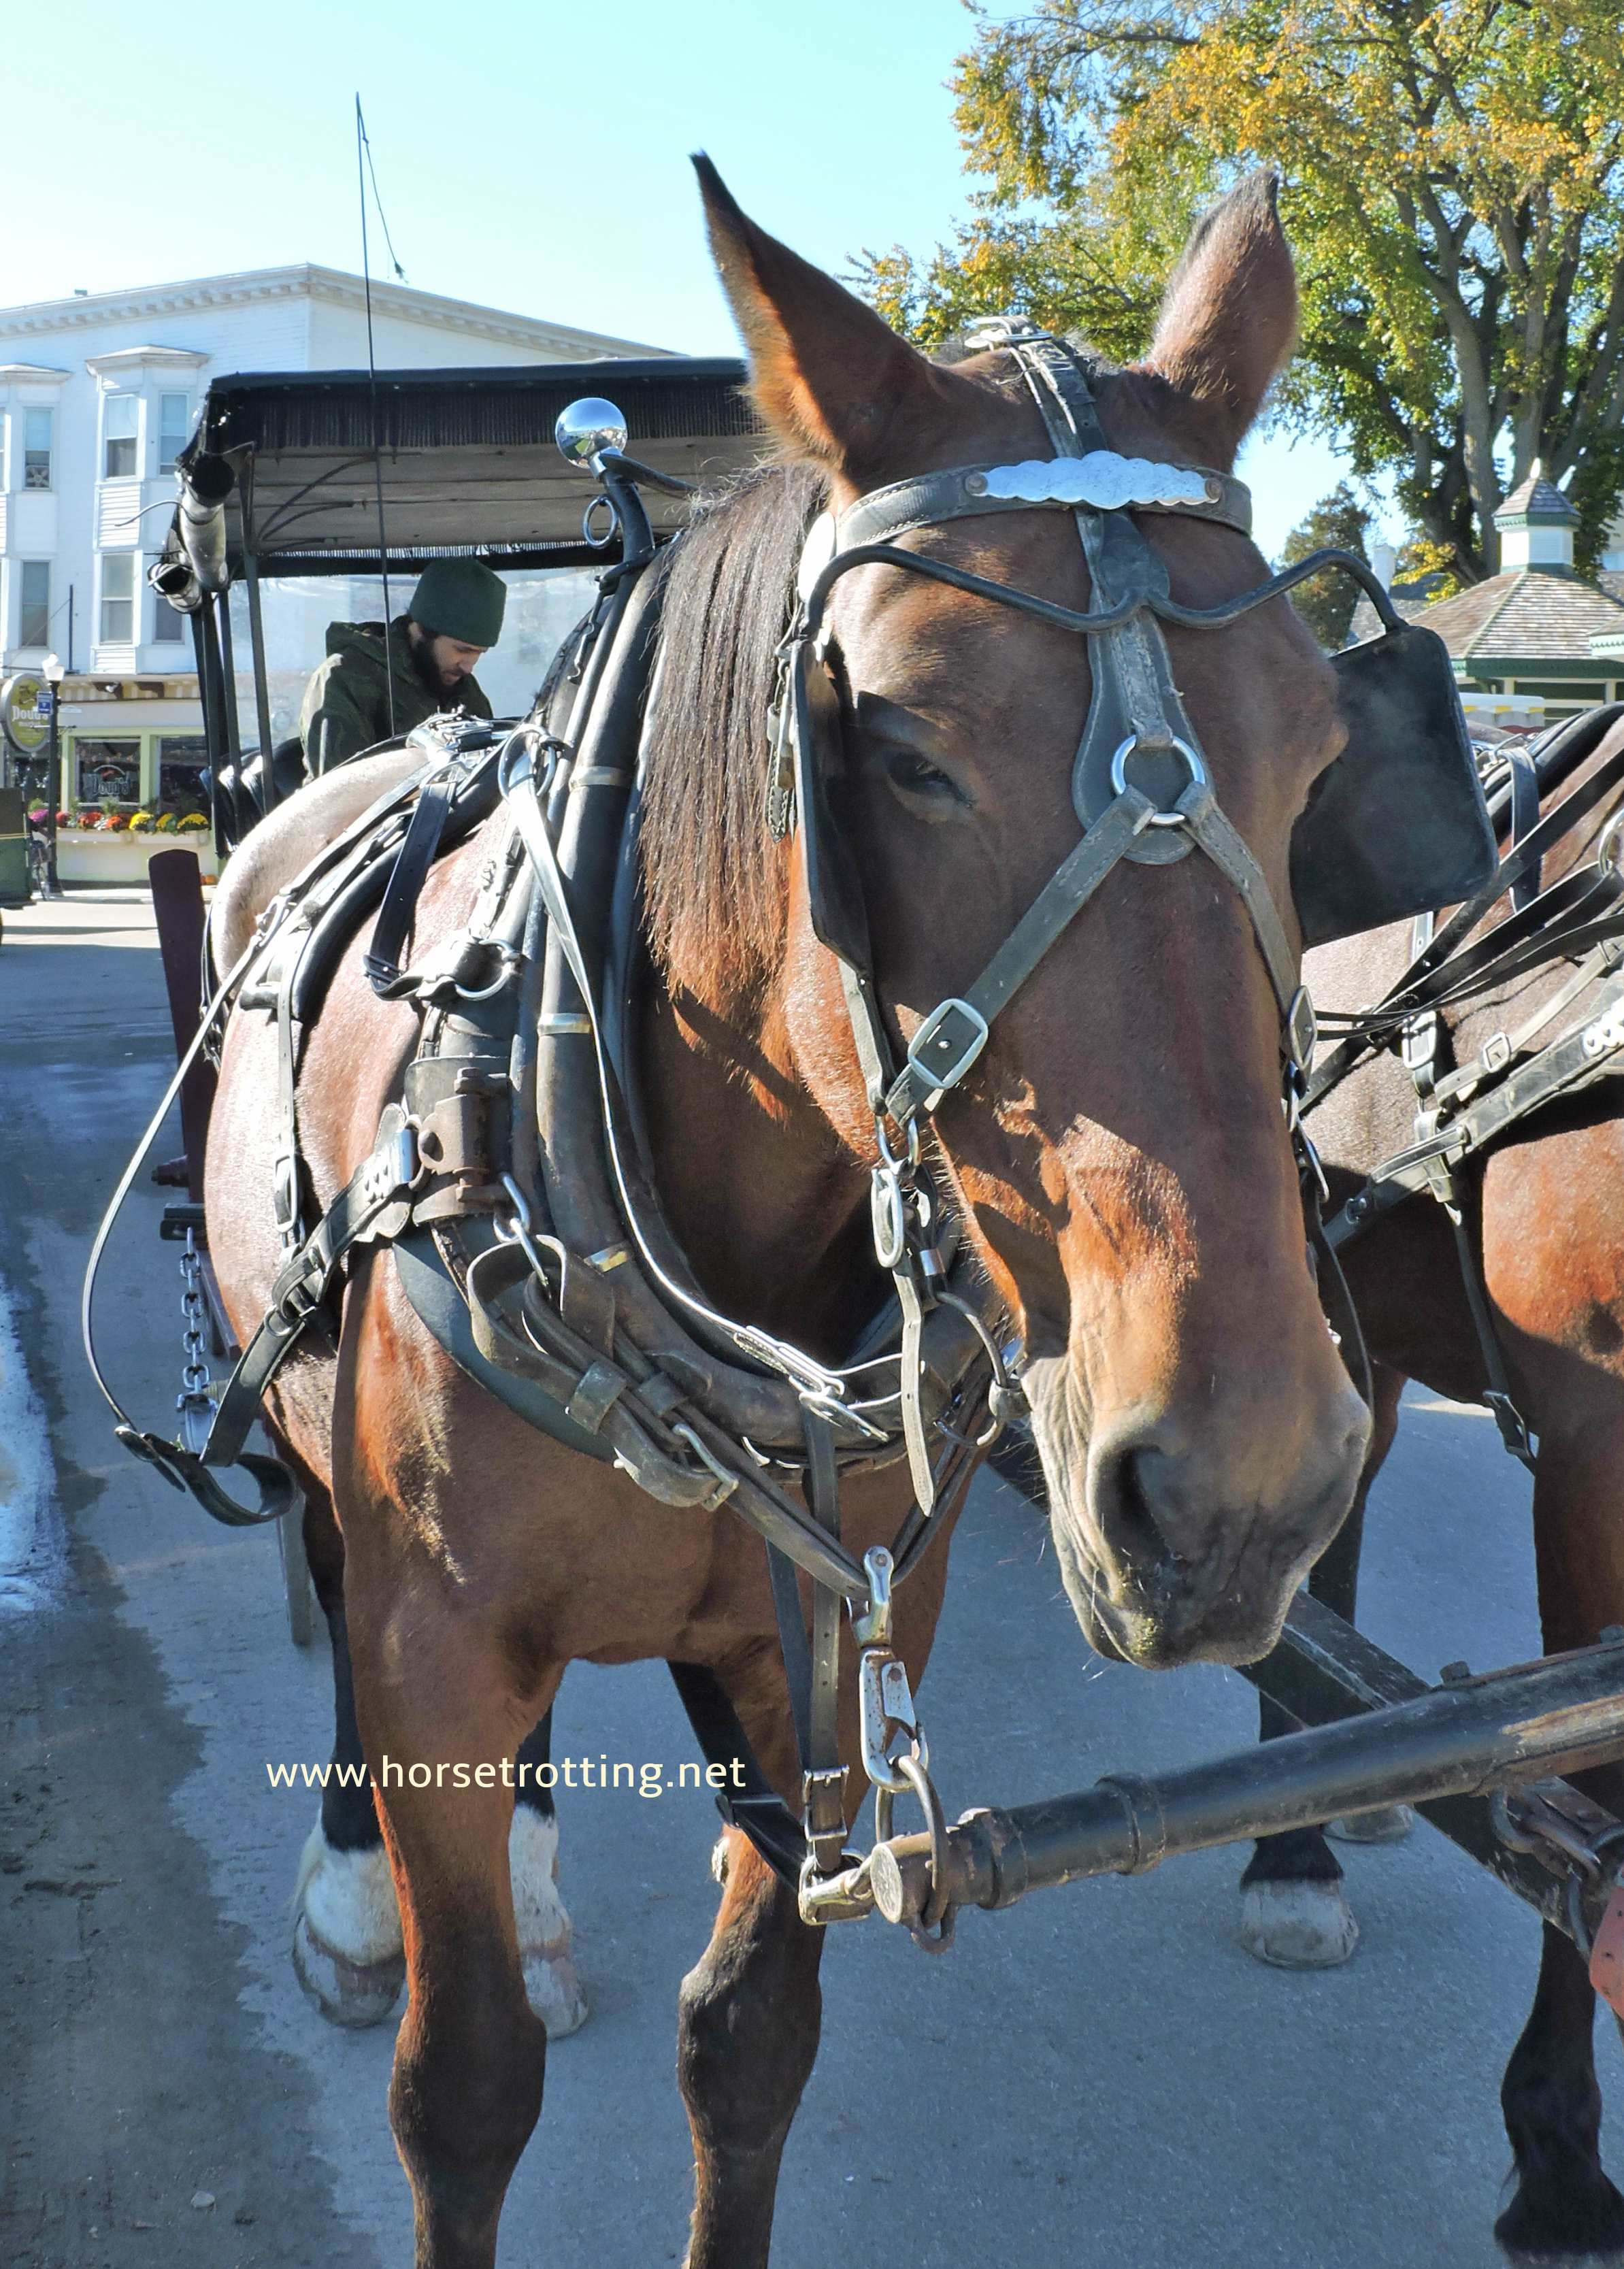 carriage horses of Mackinac Island, Michigan www.horsetrotting.net